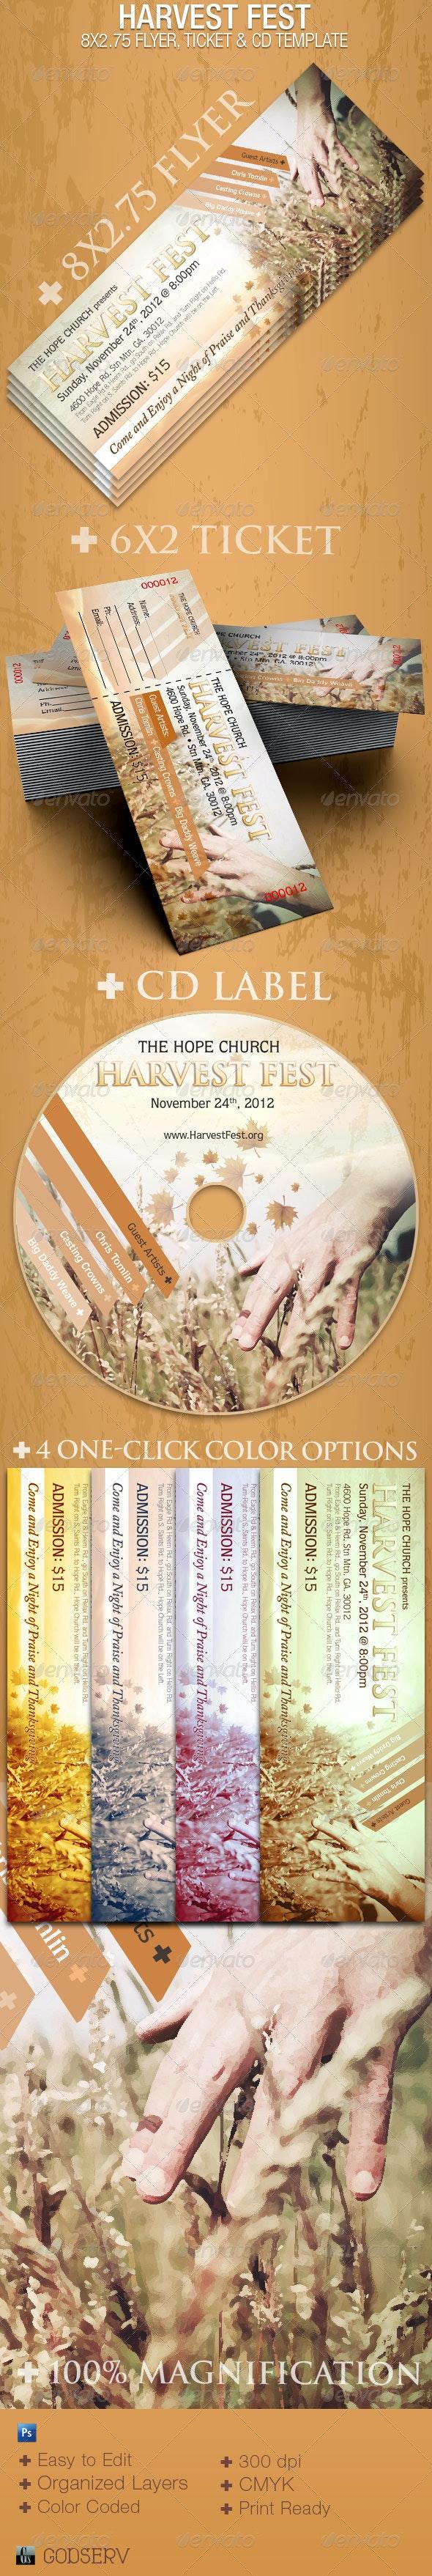 Harvest Fest Flyer CD Ticket Template - Church Flyers